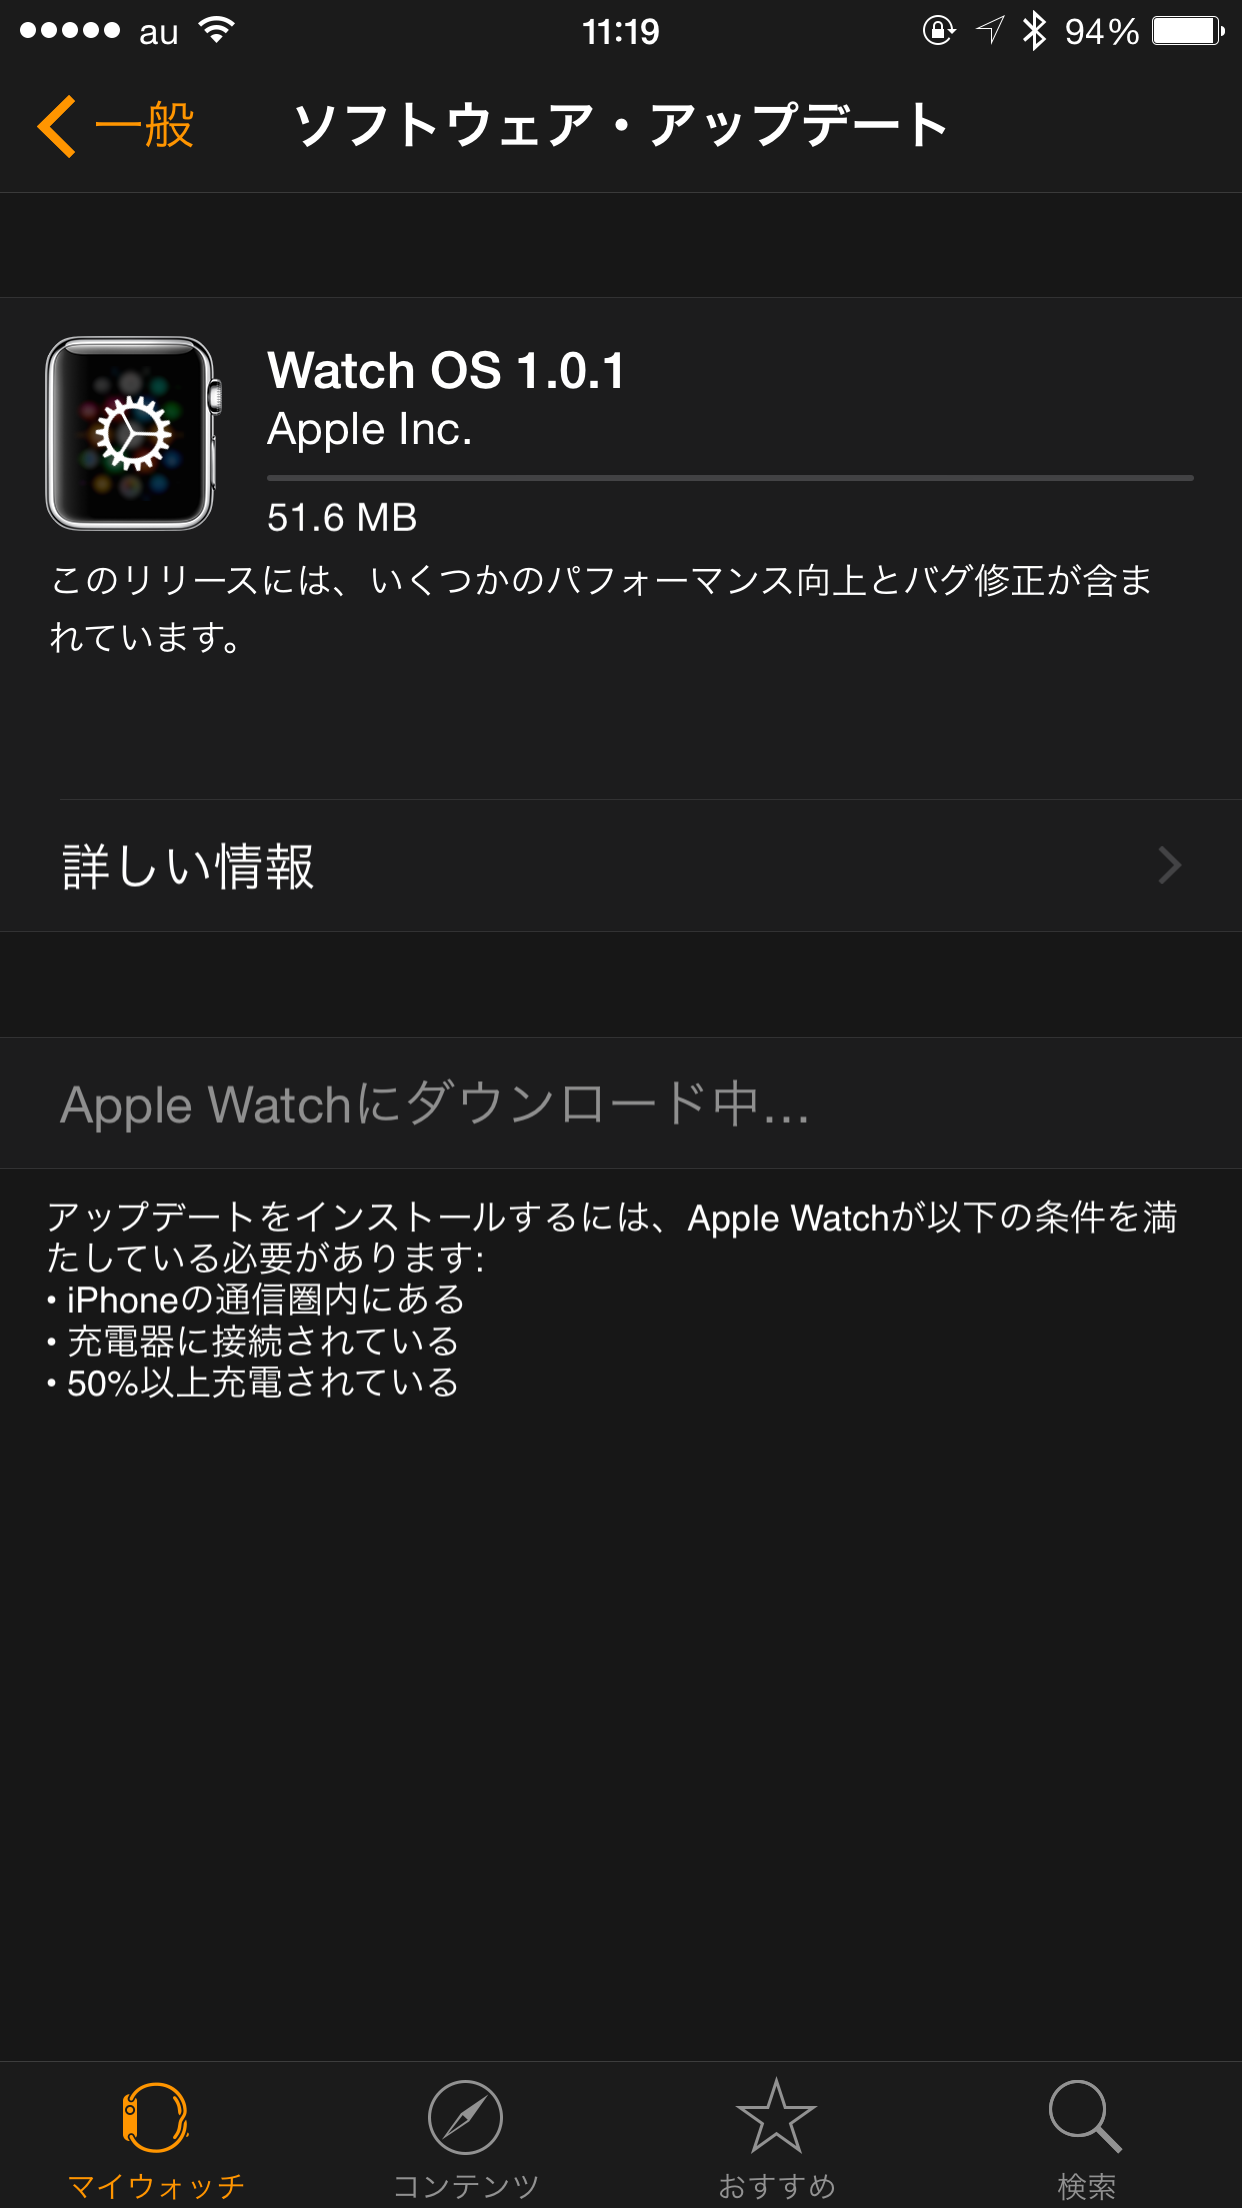 Apple Watchのソフトウェアアップデート方法